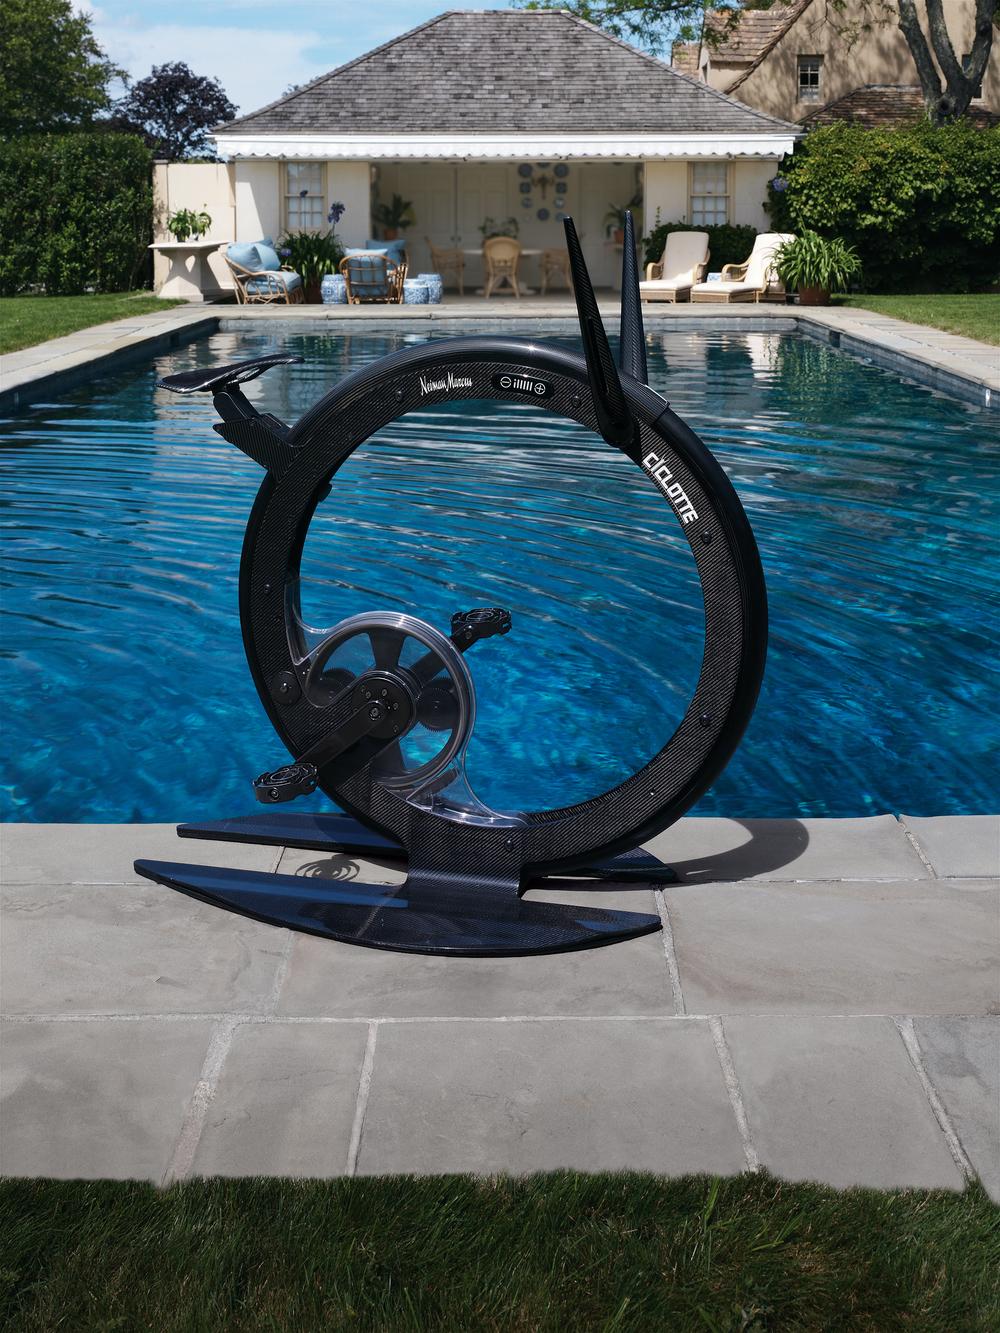 Ciclotte, $11,000